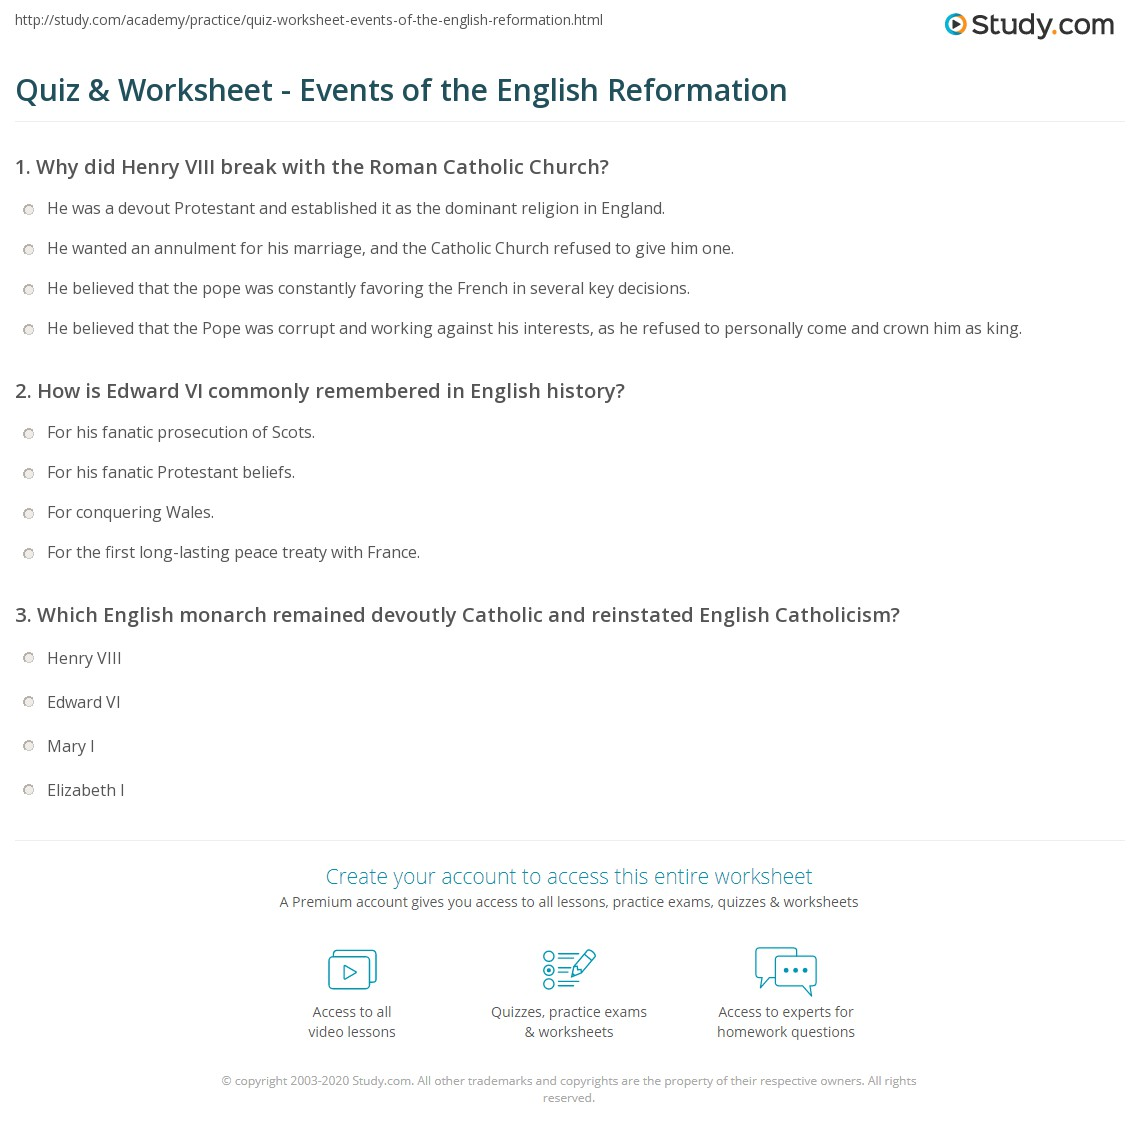 English reformation essay questions